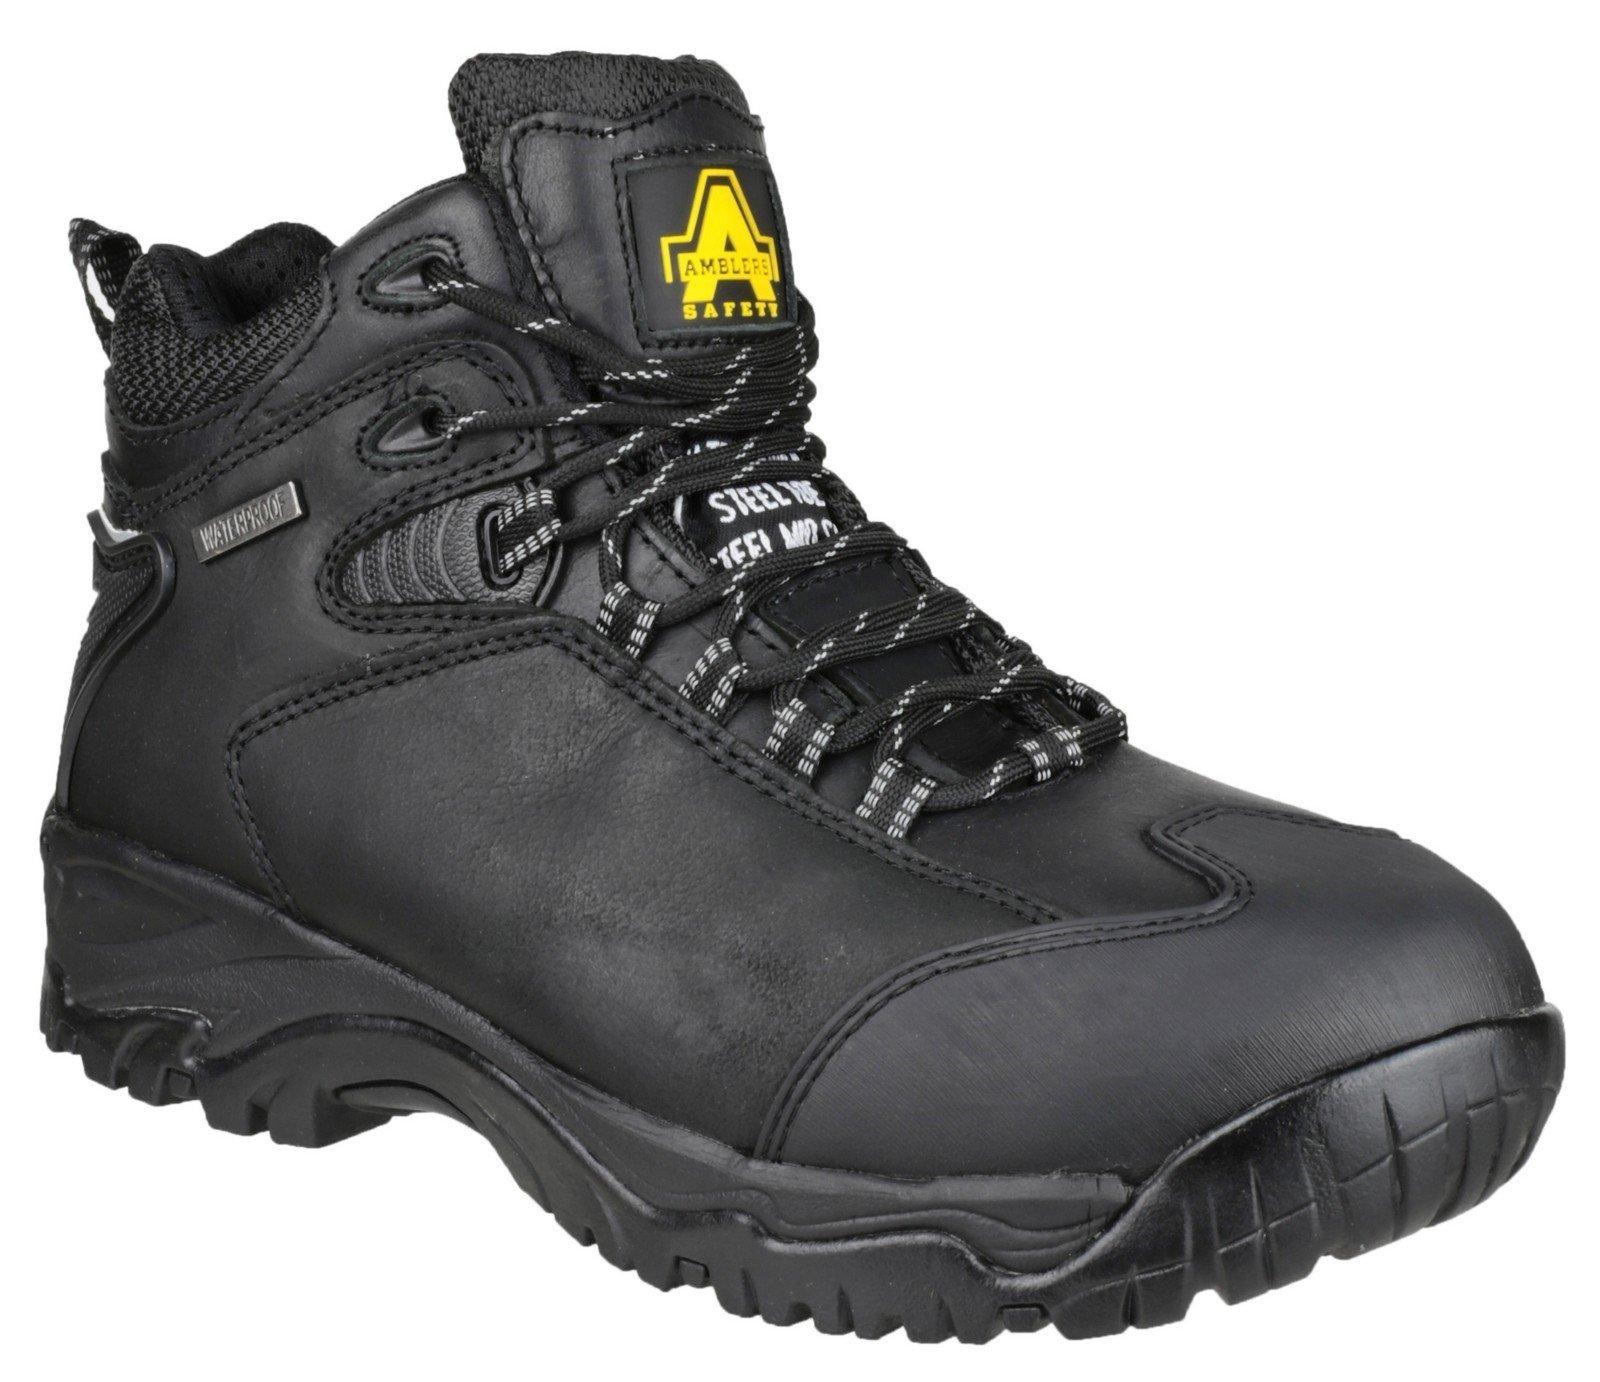 Amblers Unisex Safety Waterproof Lace up Hiker Boot Black 12319 - Black 6